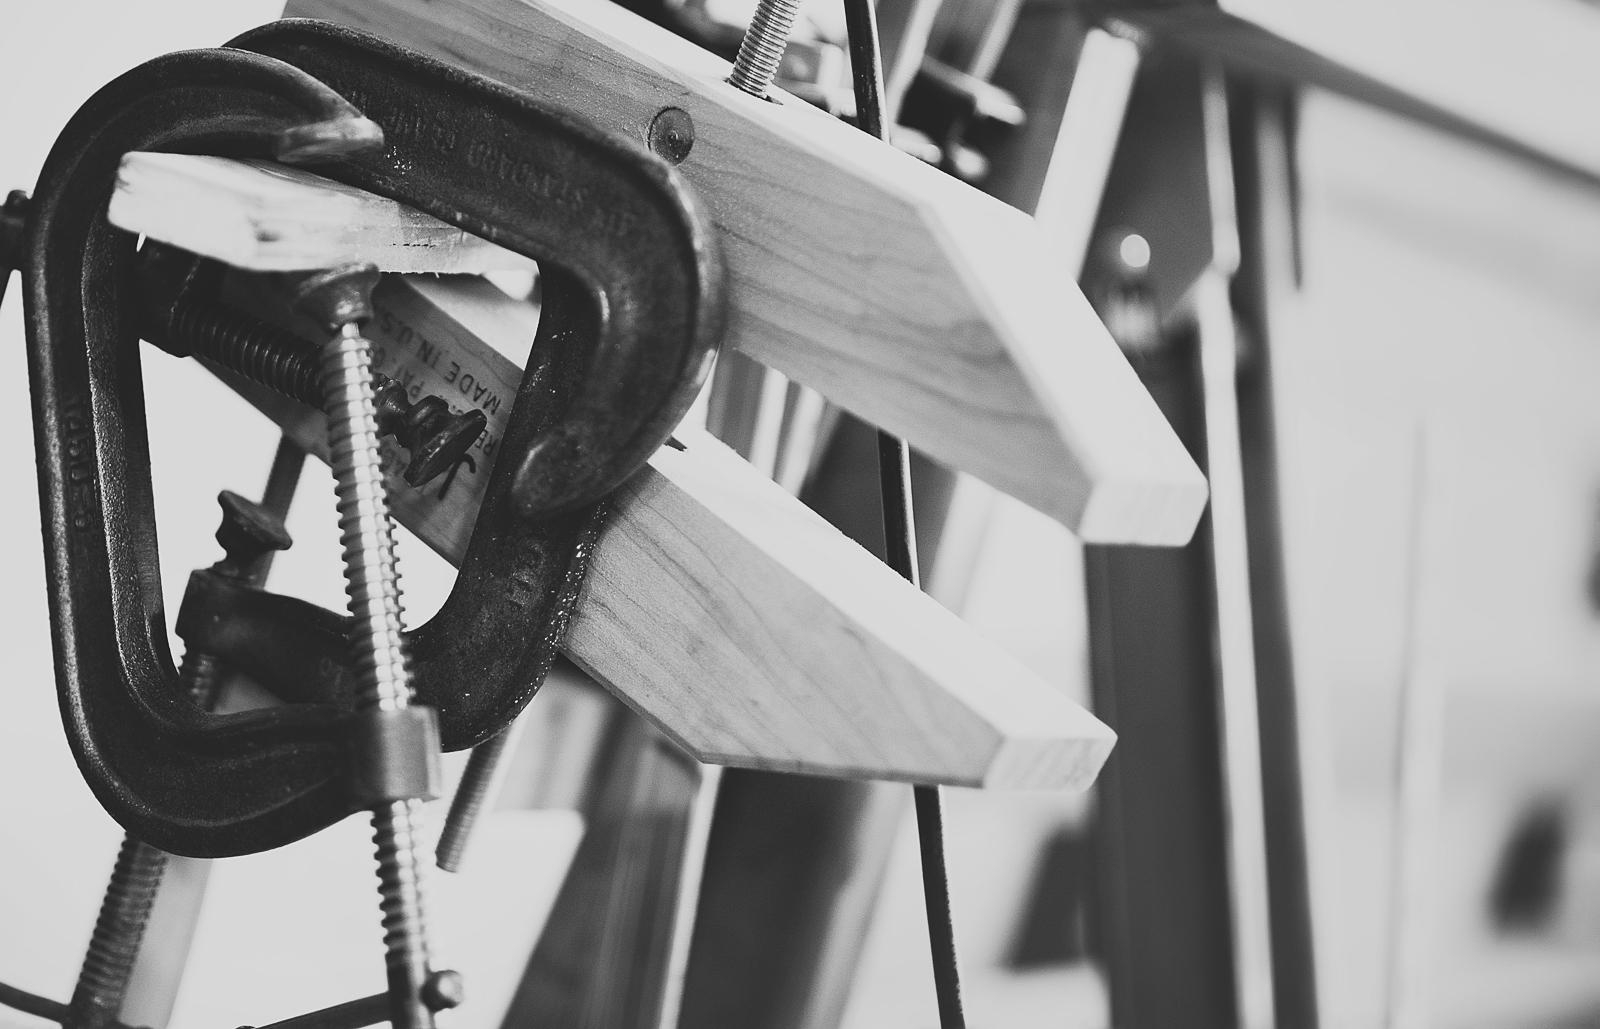 Woodworks-West-Bozeman-Montana-Builder-Cabinetry-Remodel-New-Construction-3774-2.jpg